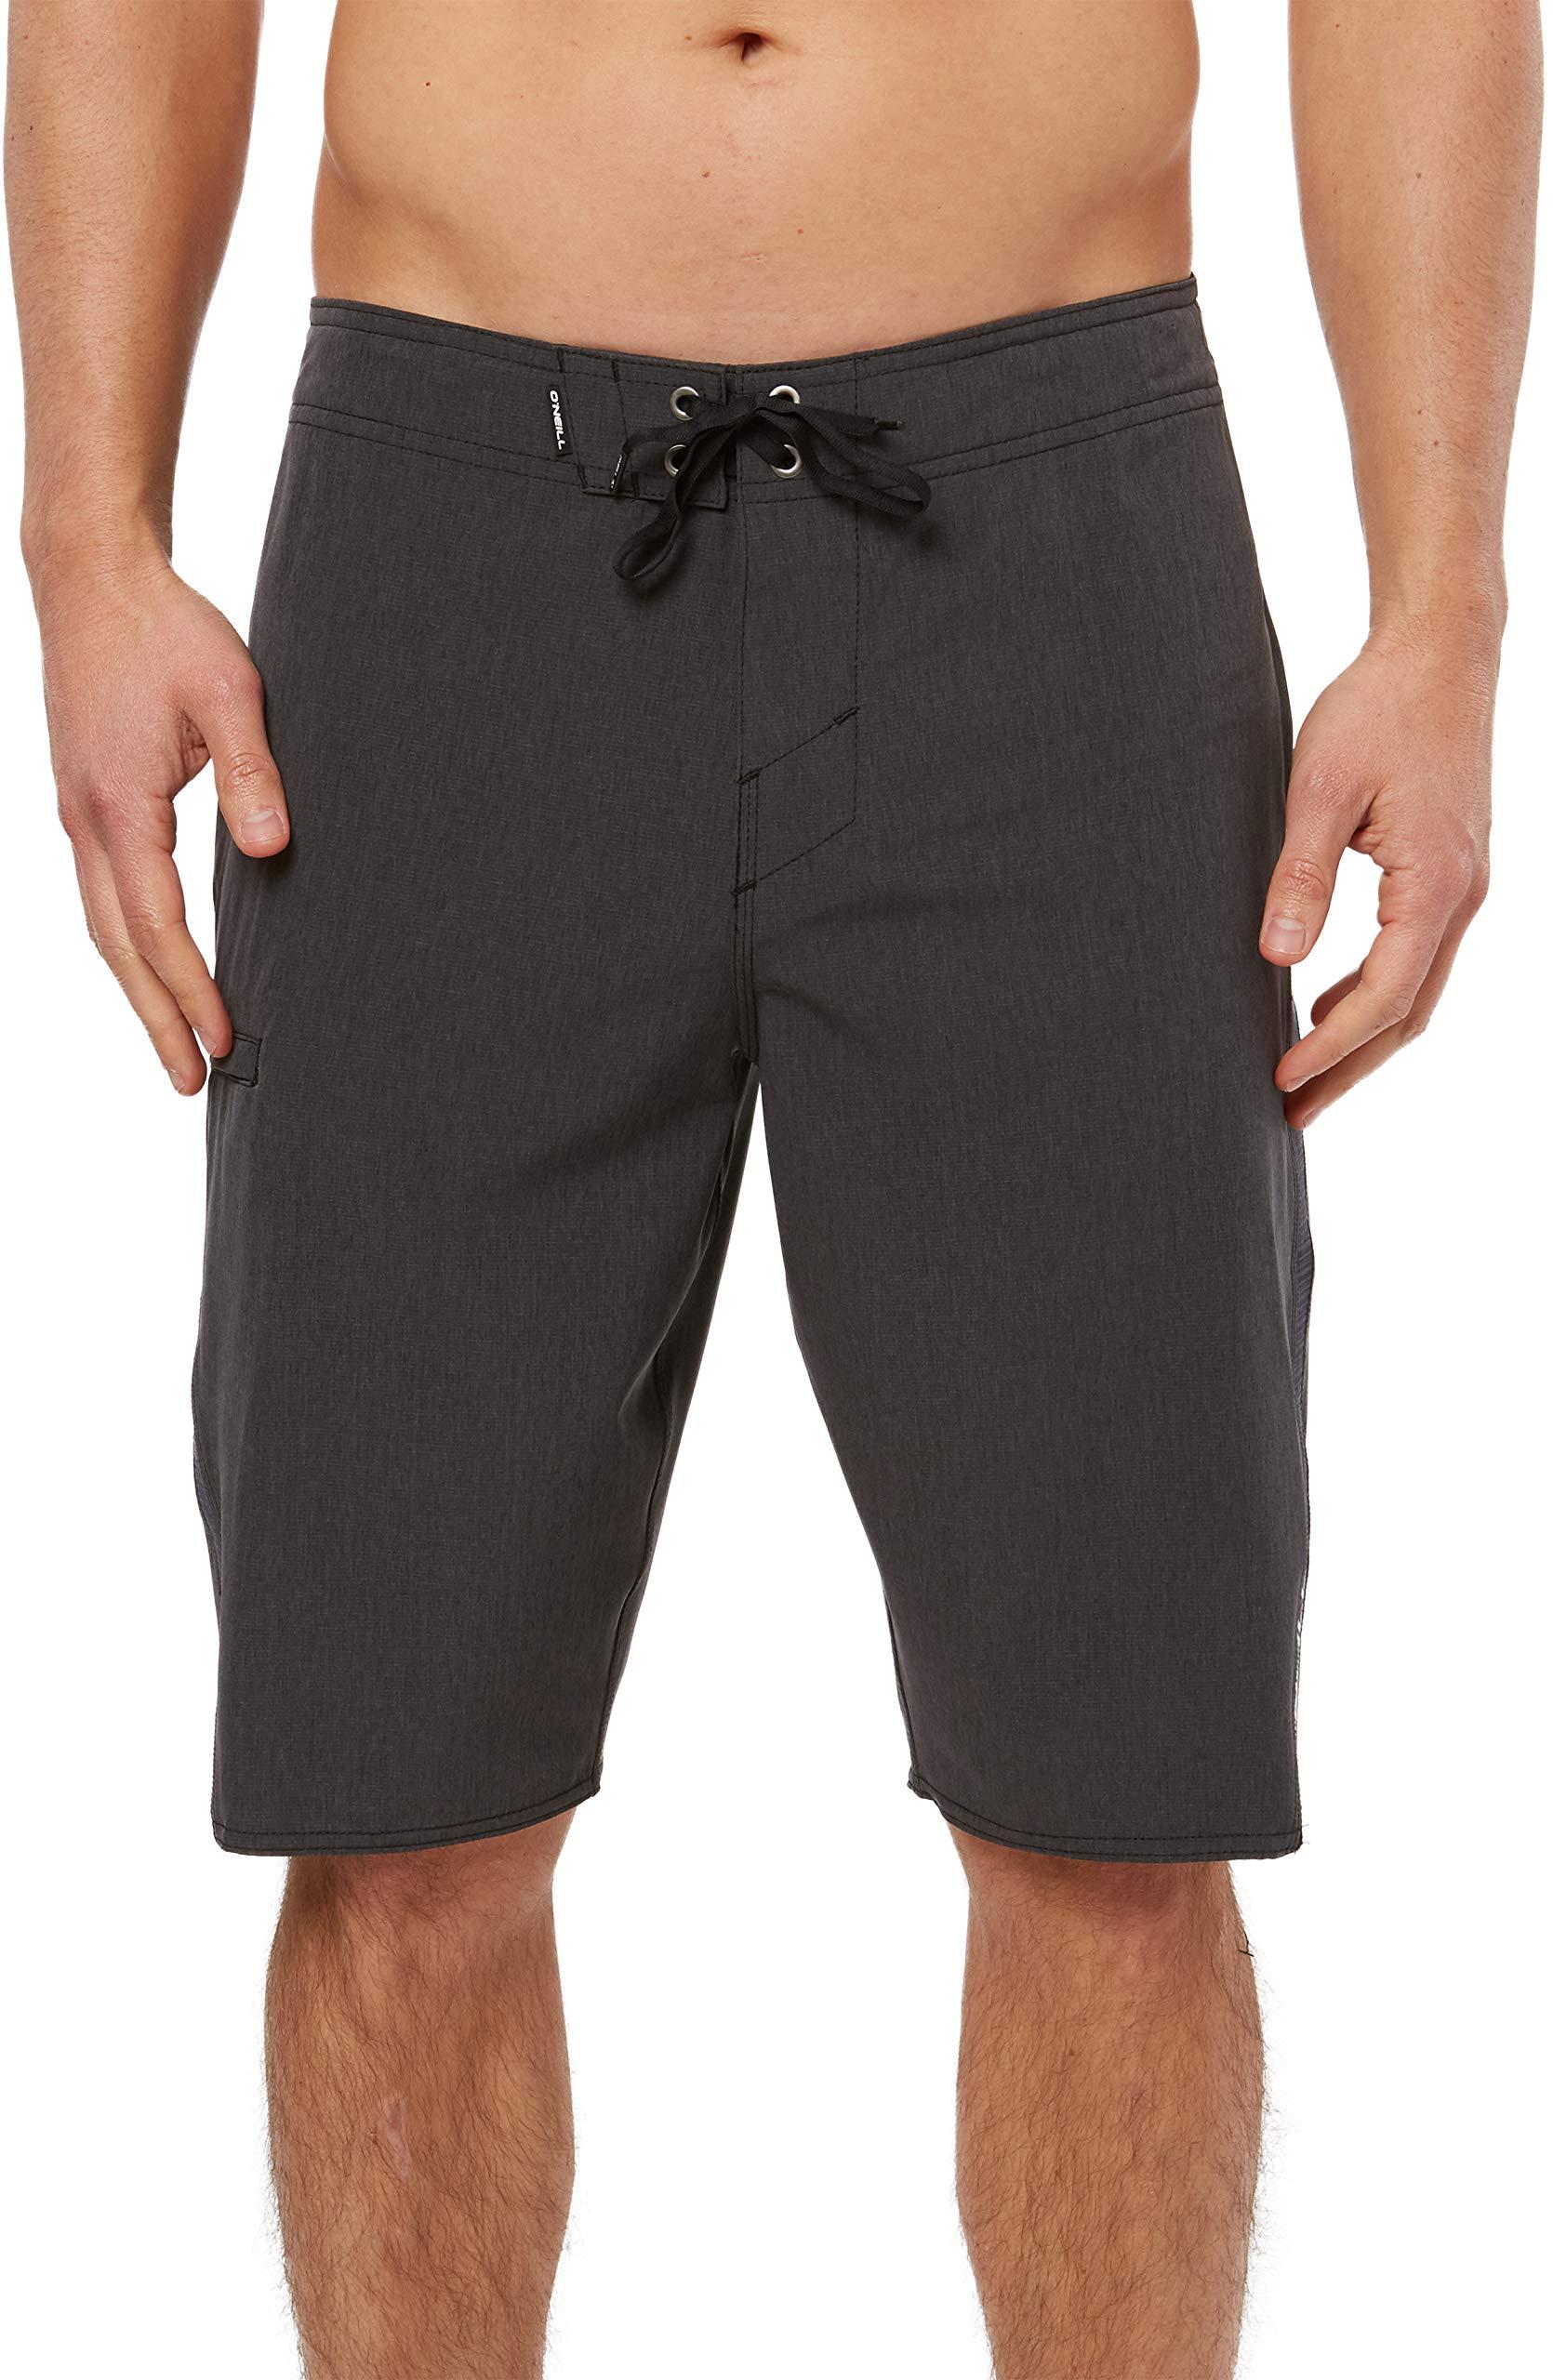 O'NEILL Men's Water Resistant Superfreak Swim Boardshorts, 21 Inch Outseam | Long-Length Swimsuit |